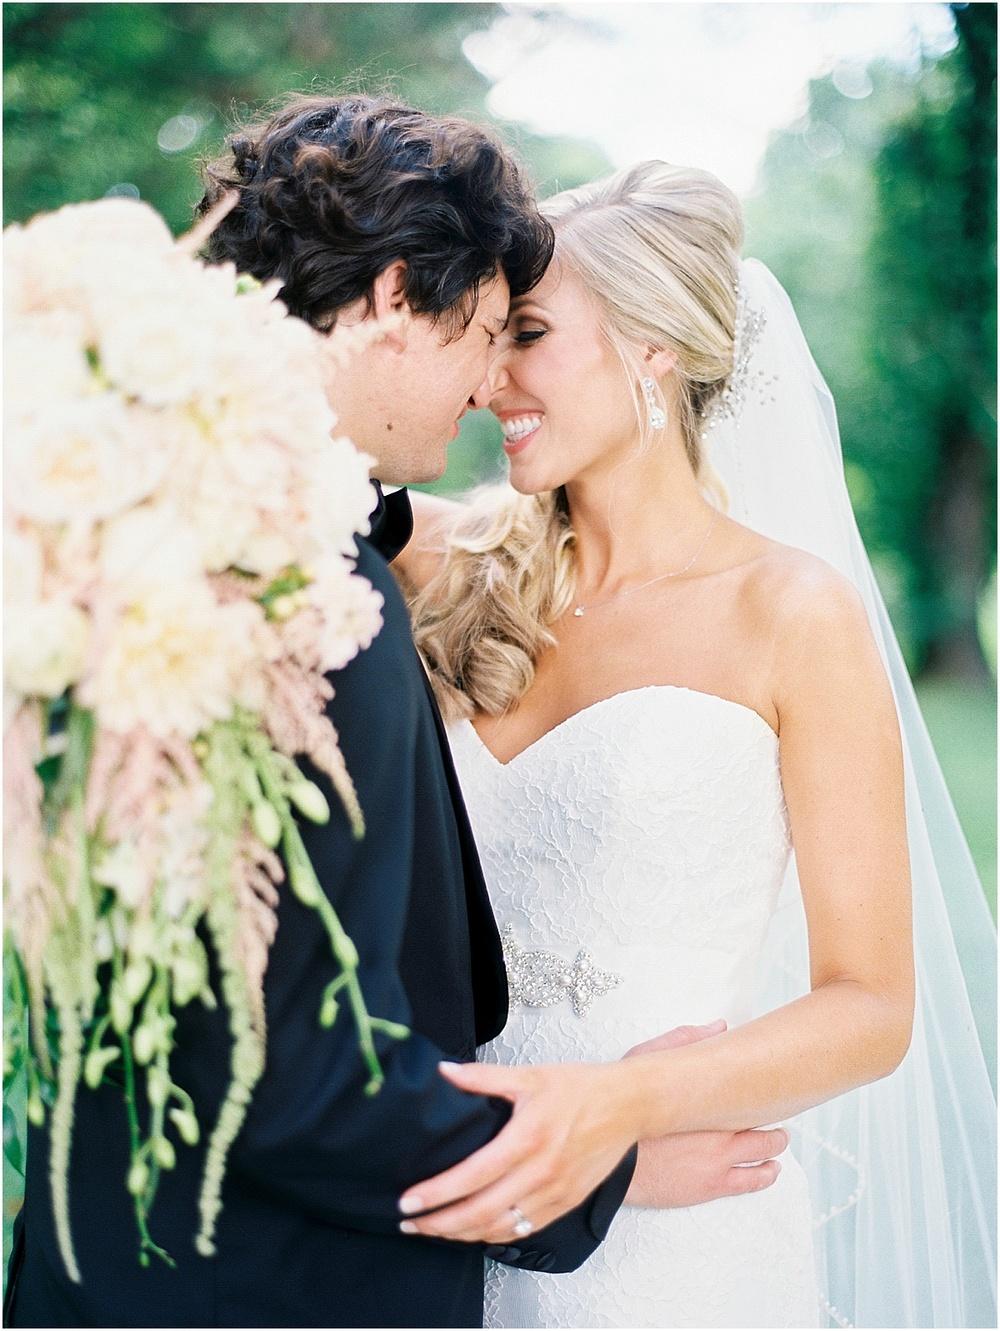 St_Louis_Wedding_Fine_Art_Film_Photographer_Jordan_Brittley_(www.jordanbrittley.com)_0047.jpg